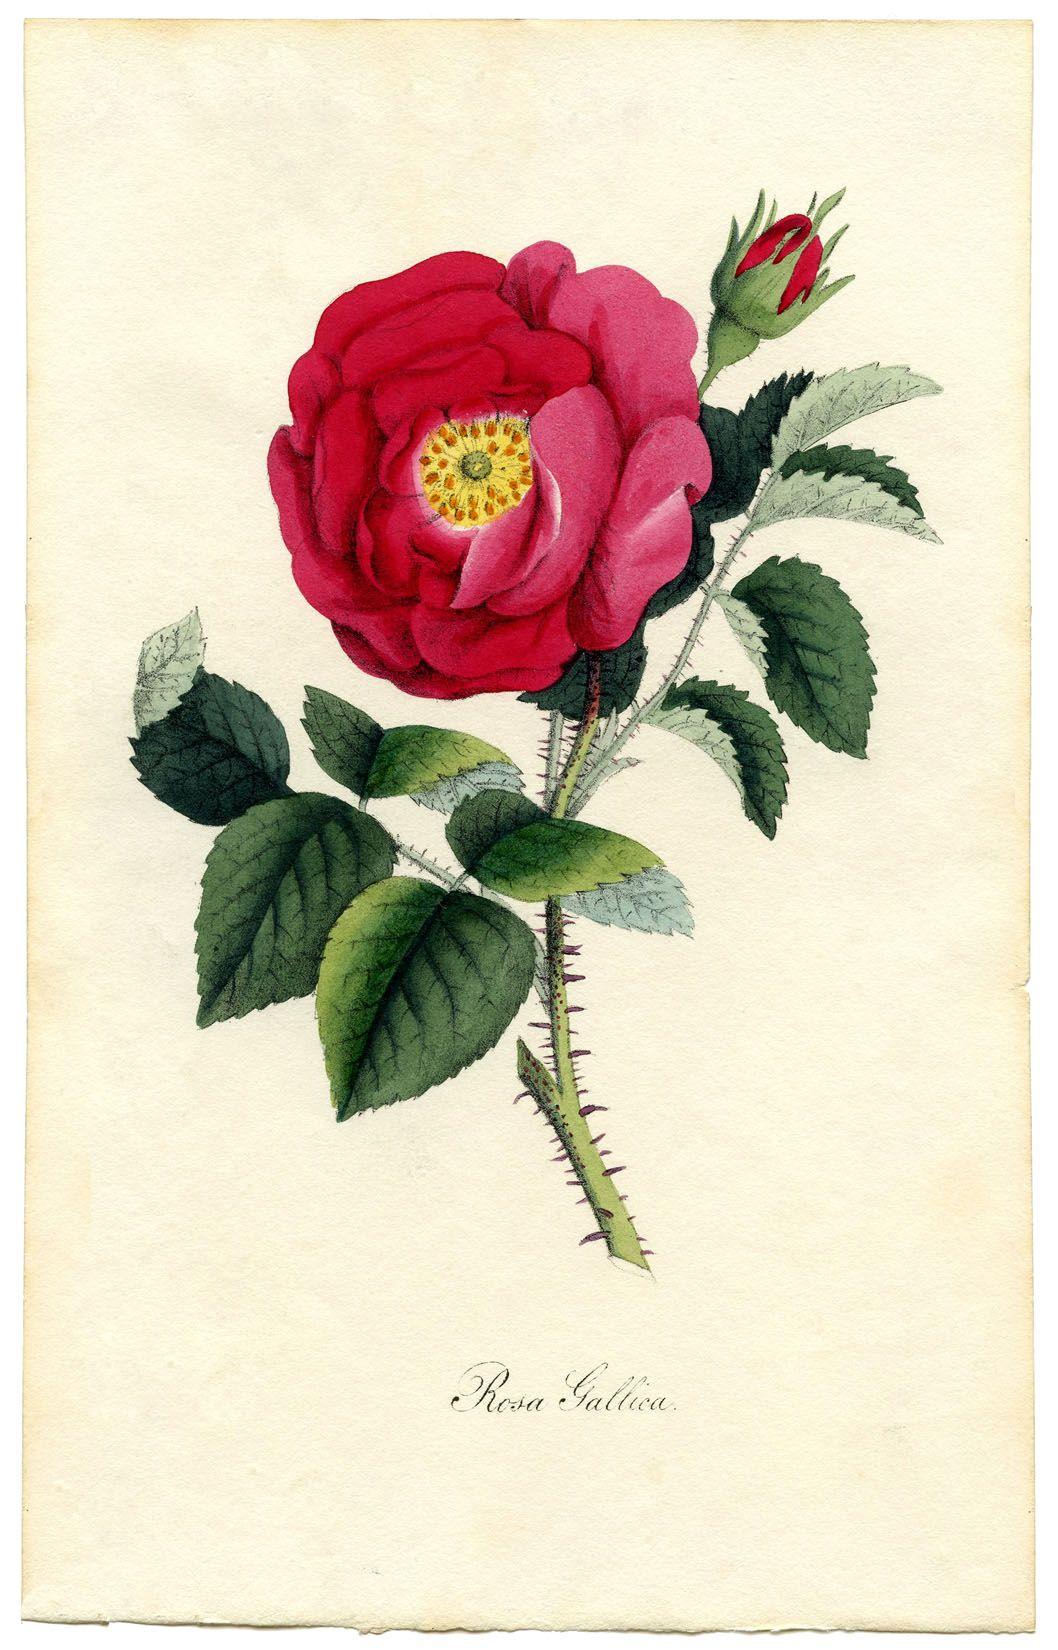 Rose Botanical Print - the Graphics Fairy